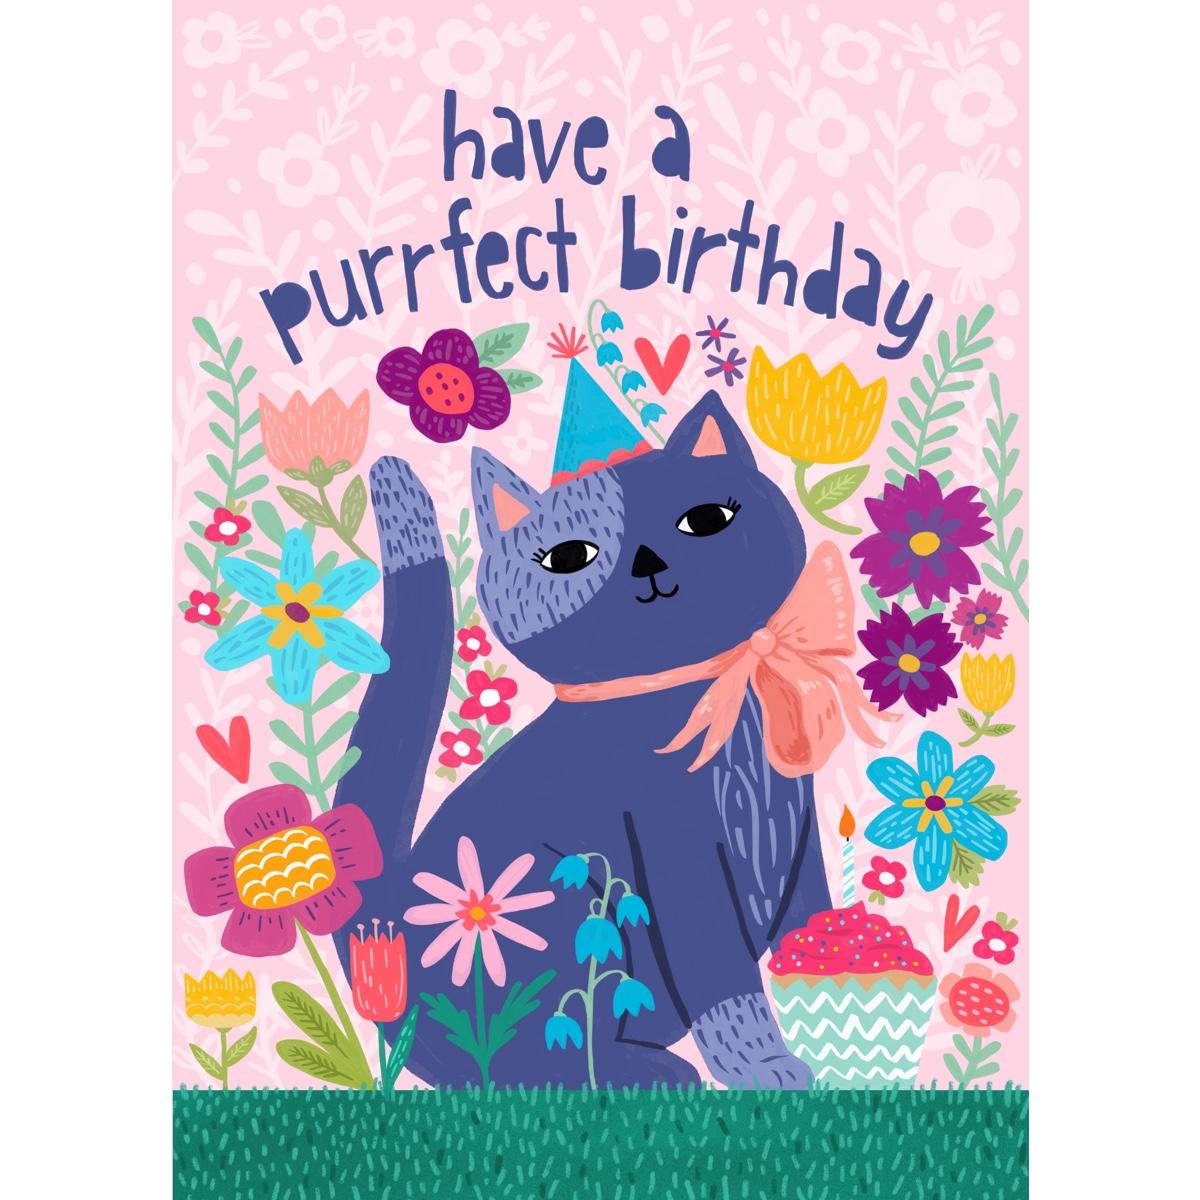 jjd-birthday_purrfectcat